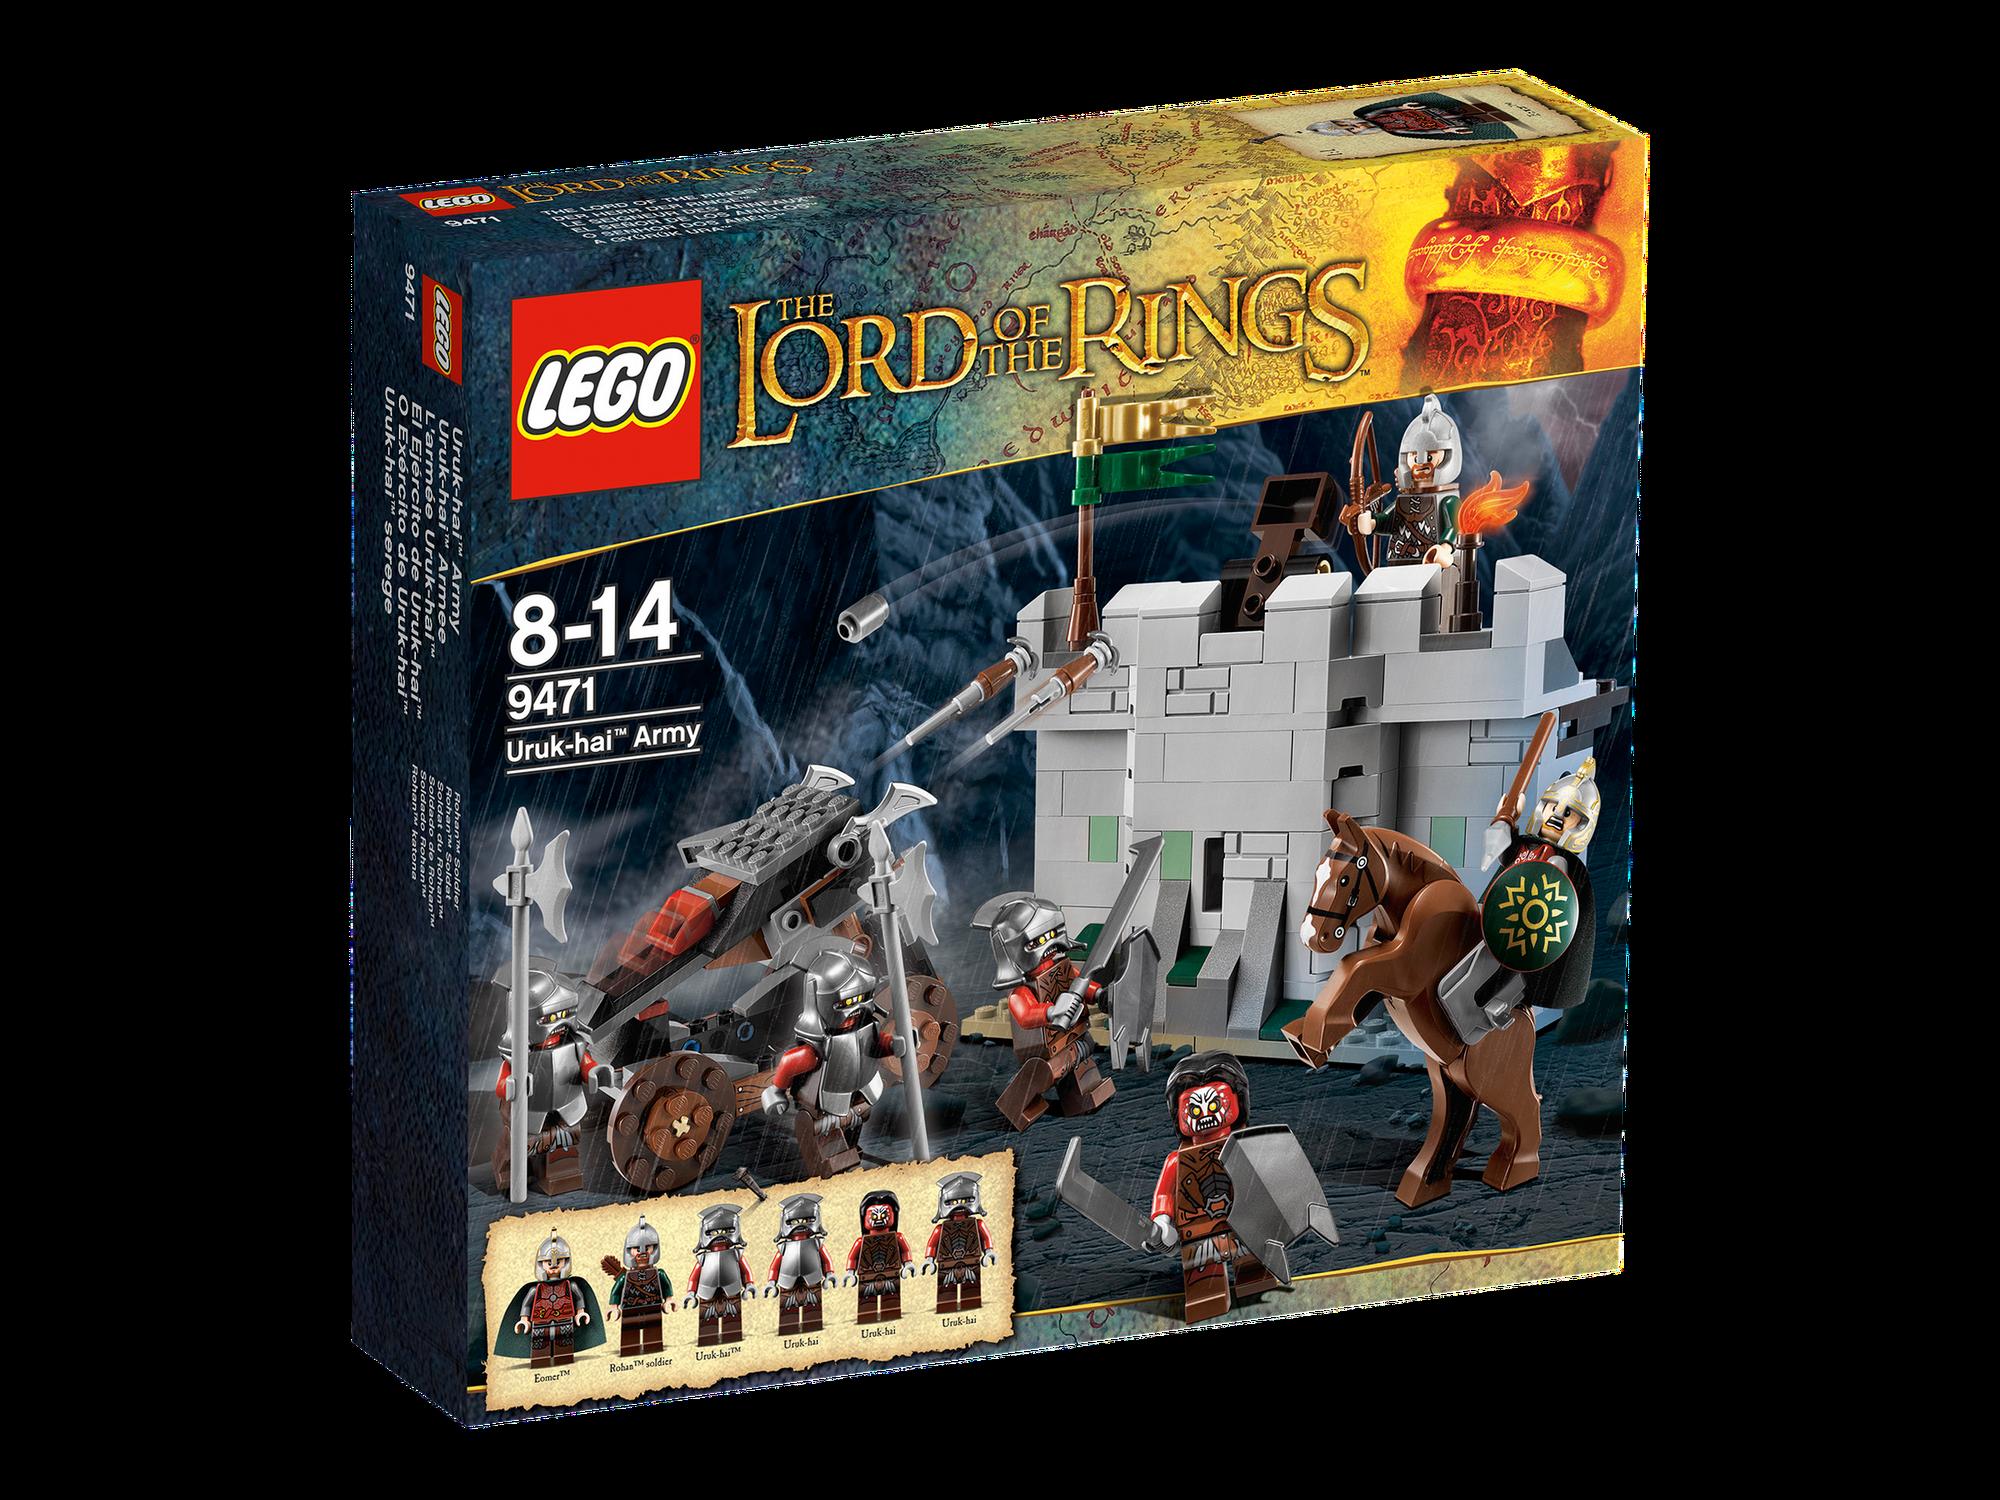 9471 Uruk Hai Army Brickipedia Fandom Powered By Wikia Lego The Lord Of Rings Battle At Black Gate 79007